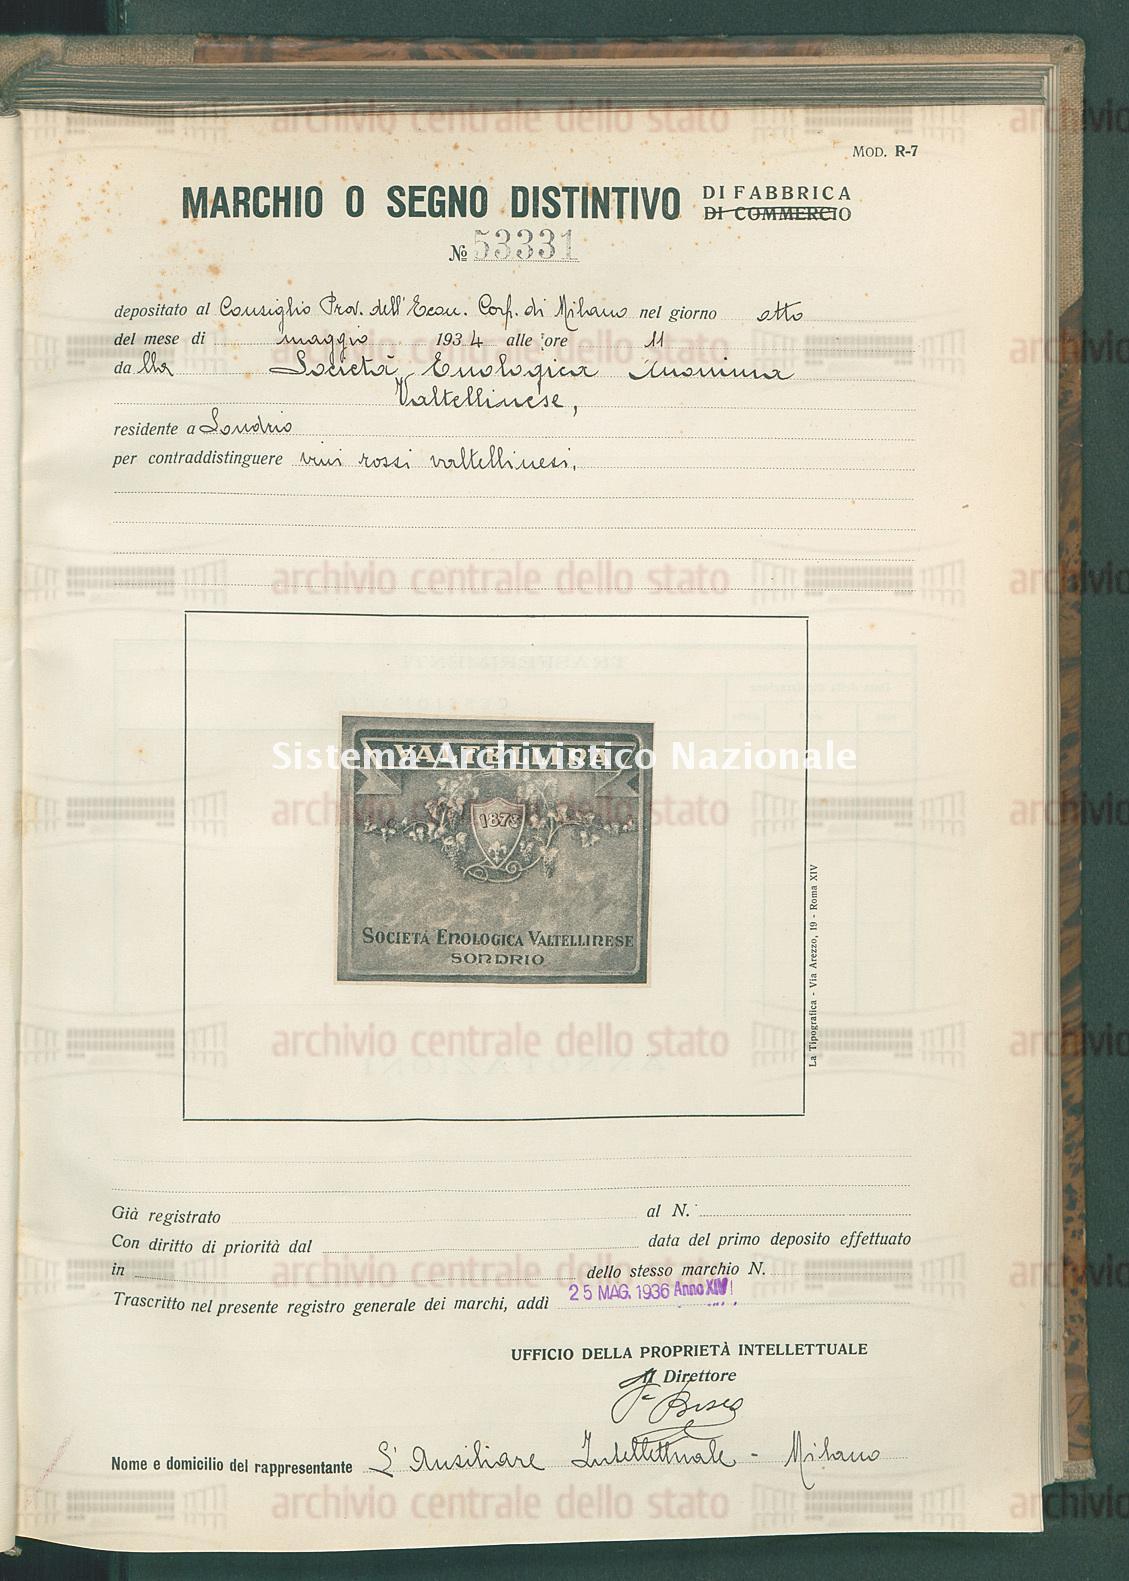 Vini rossi valtellinesi Societa' Enologica Anonima Valtellinese (25/05/1936)